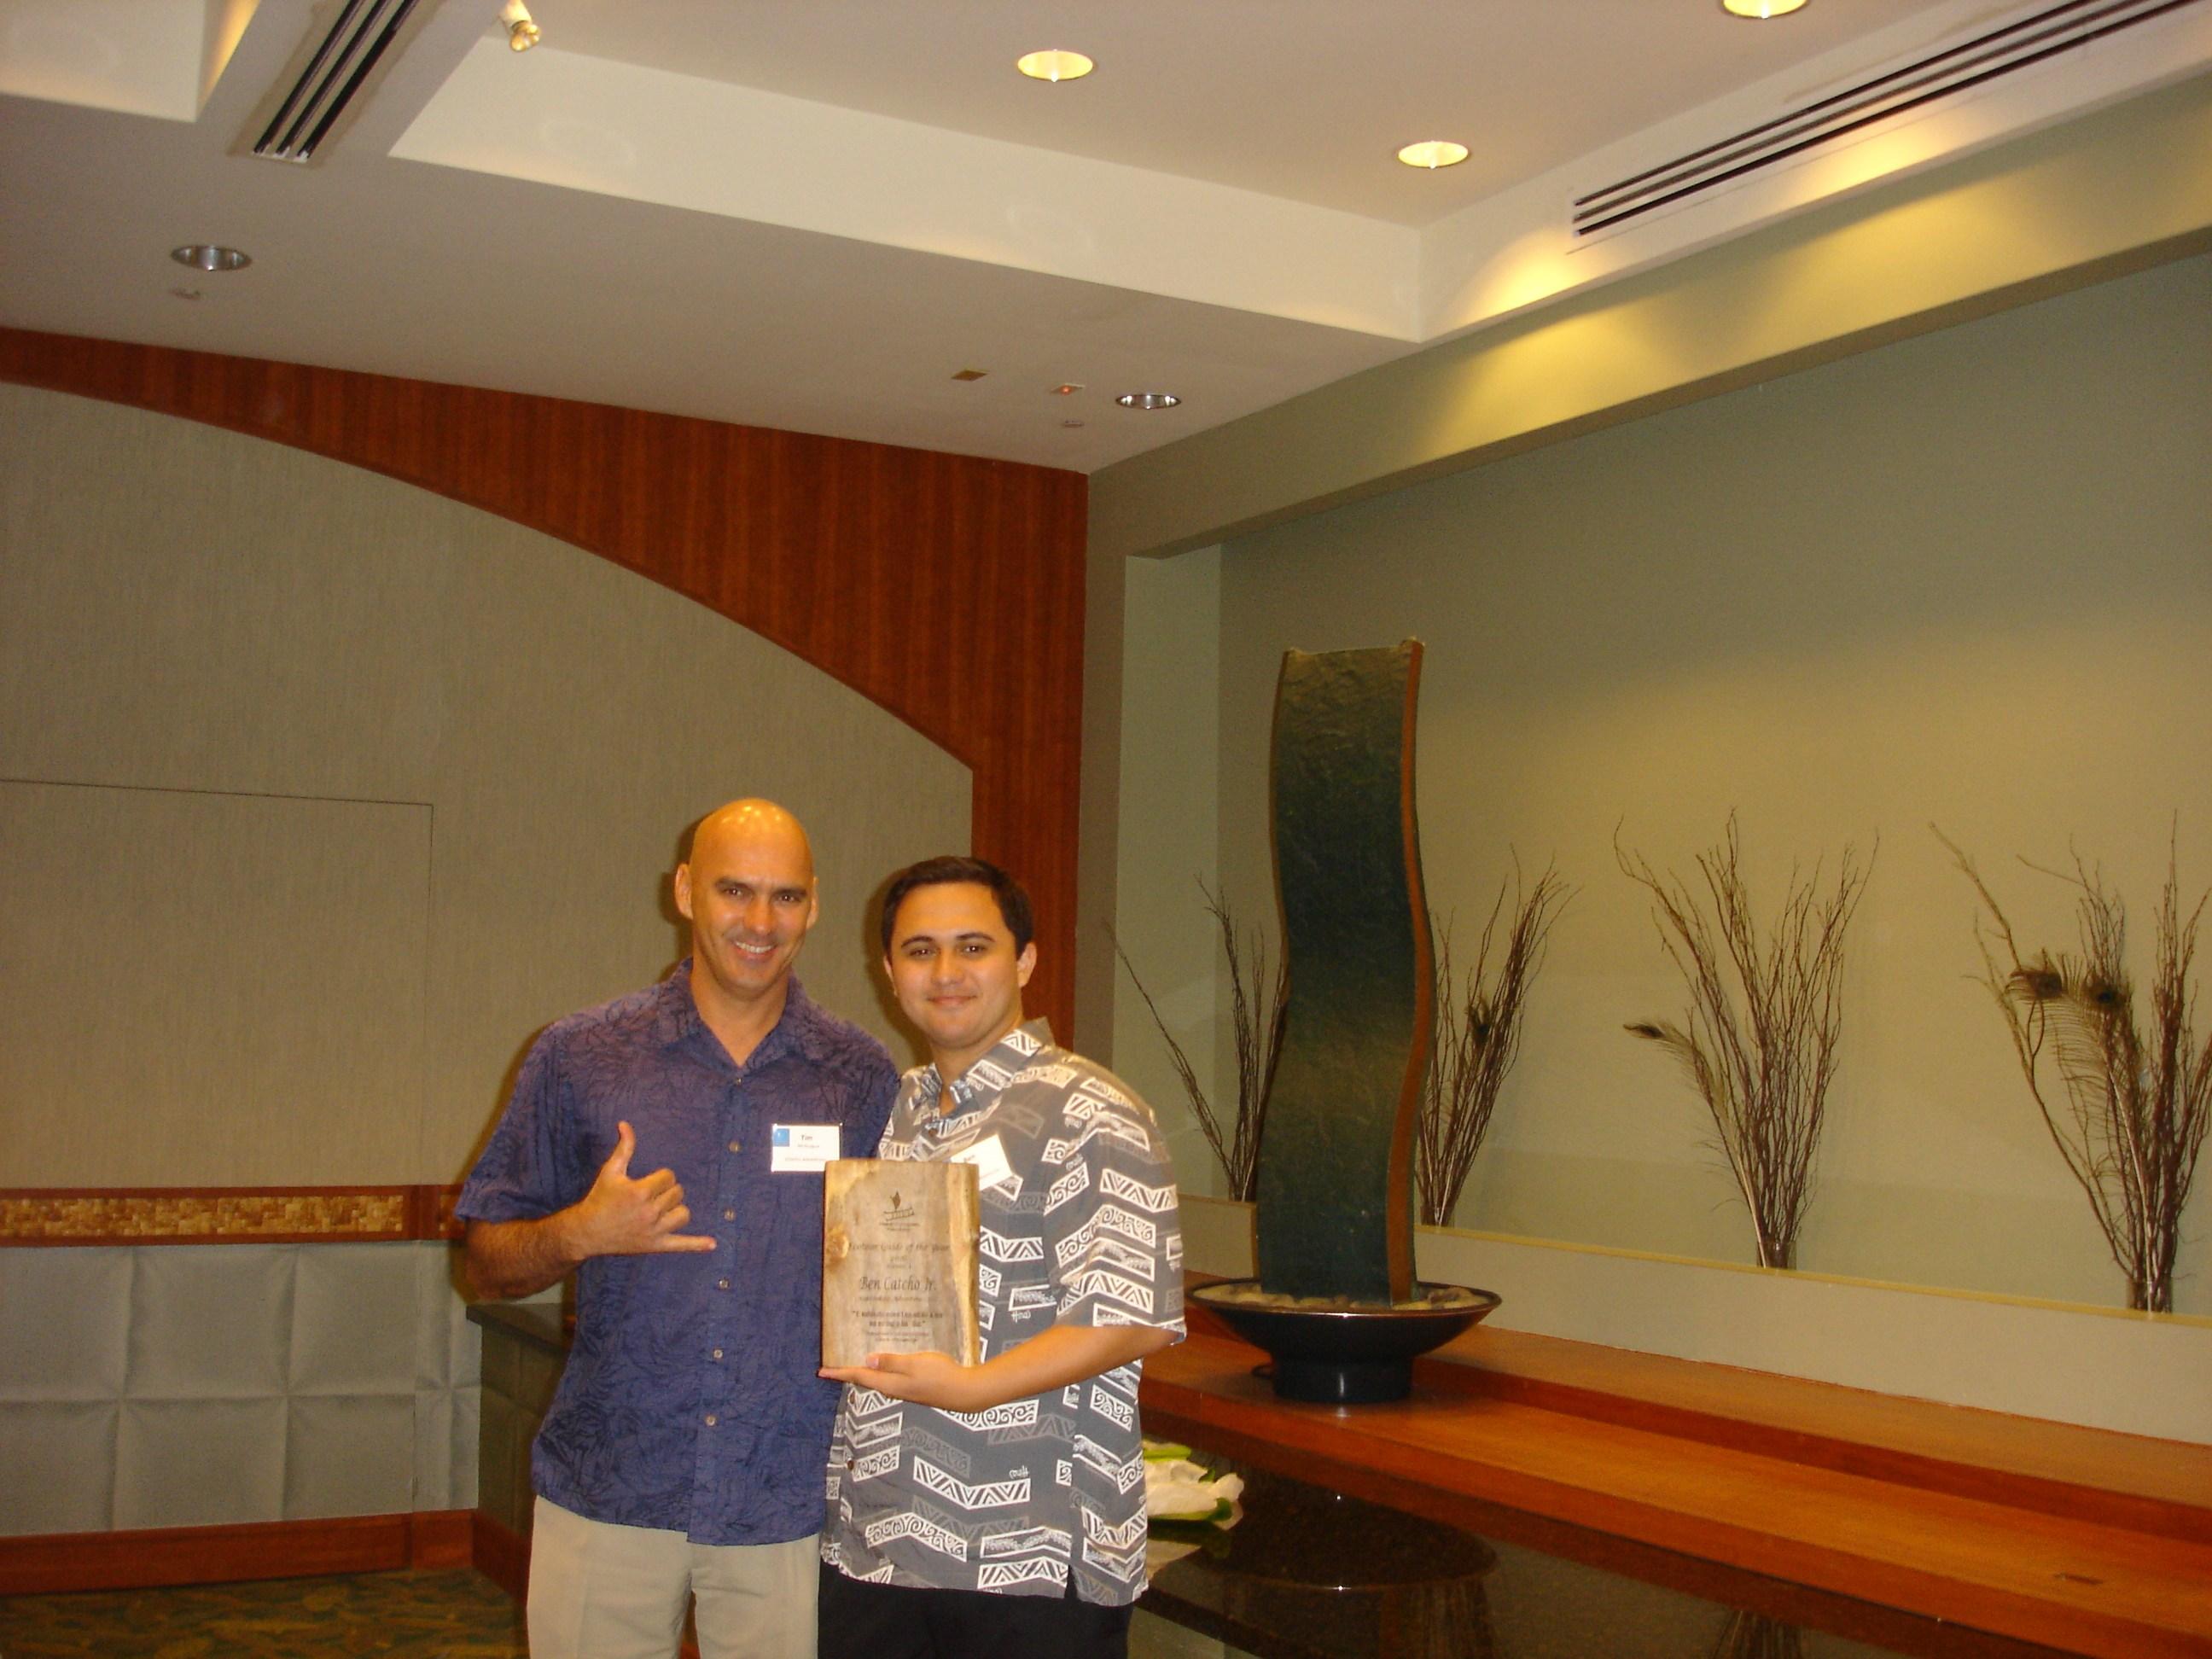 tim-with-tour-guide-winner-ben-catcho-jr-kapohokine-adventures